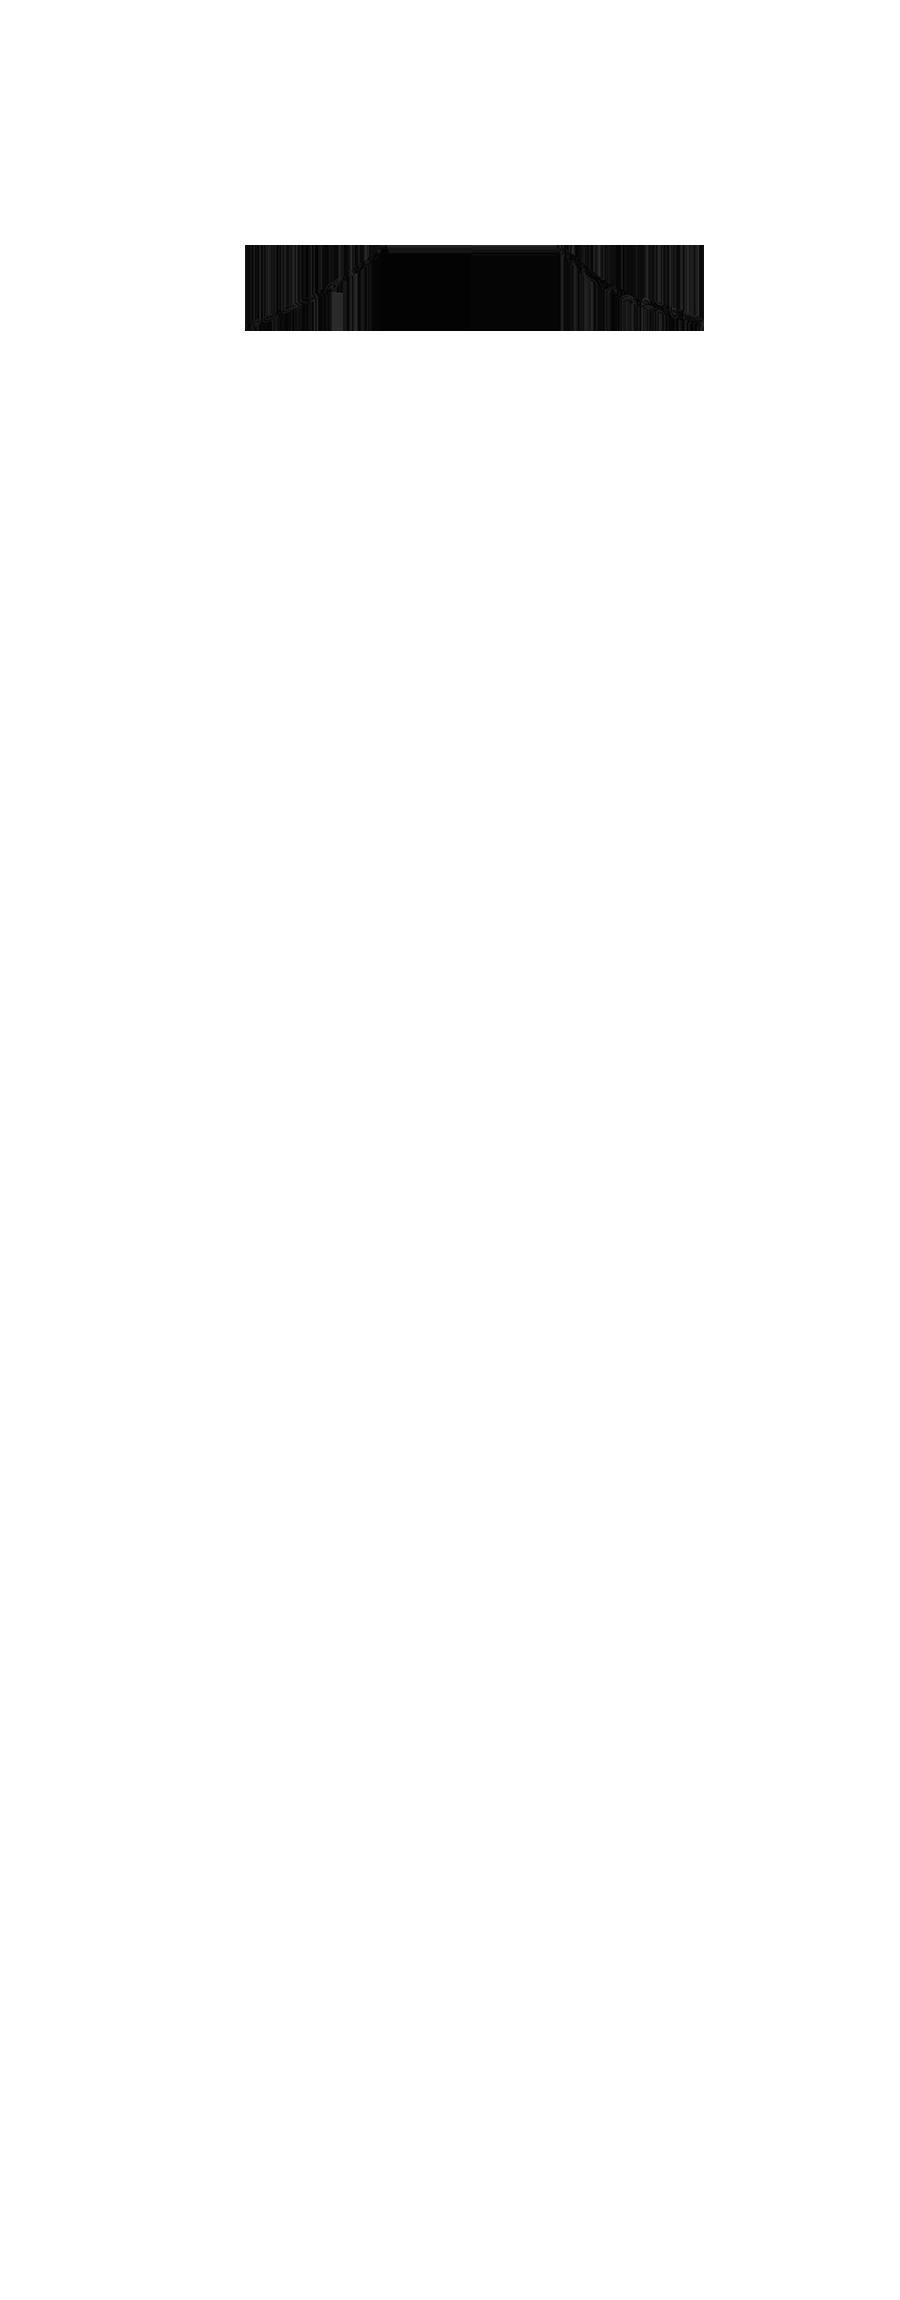 NEFL-11